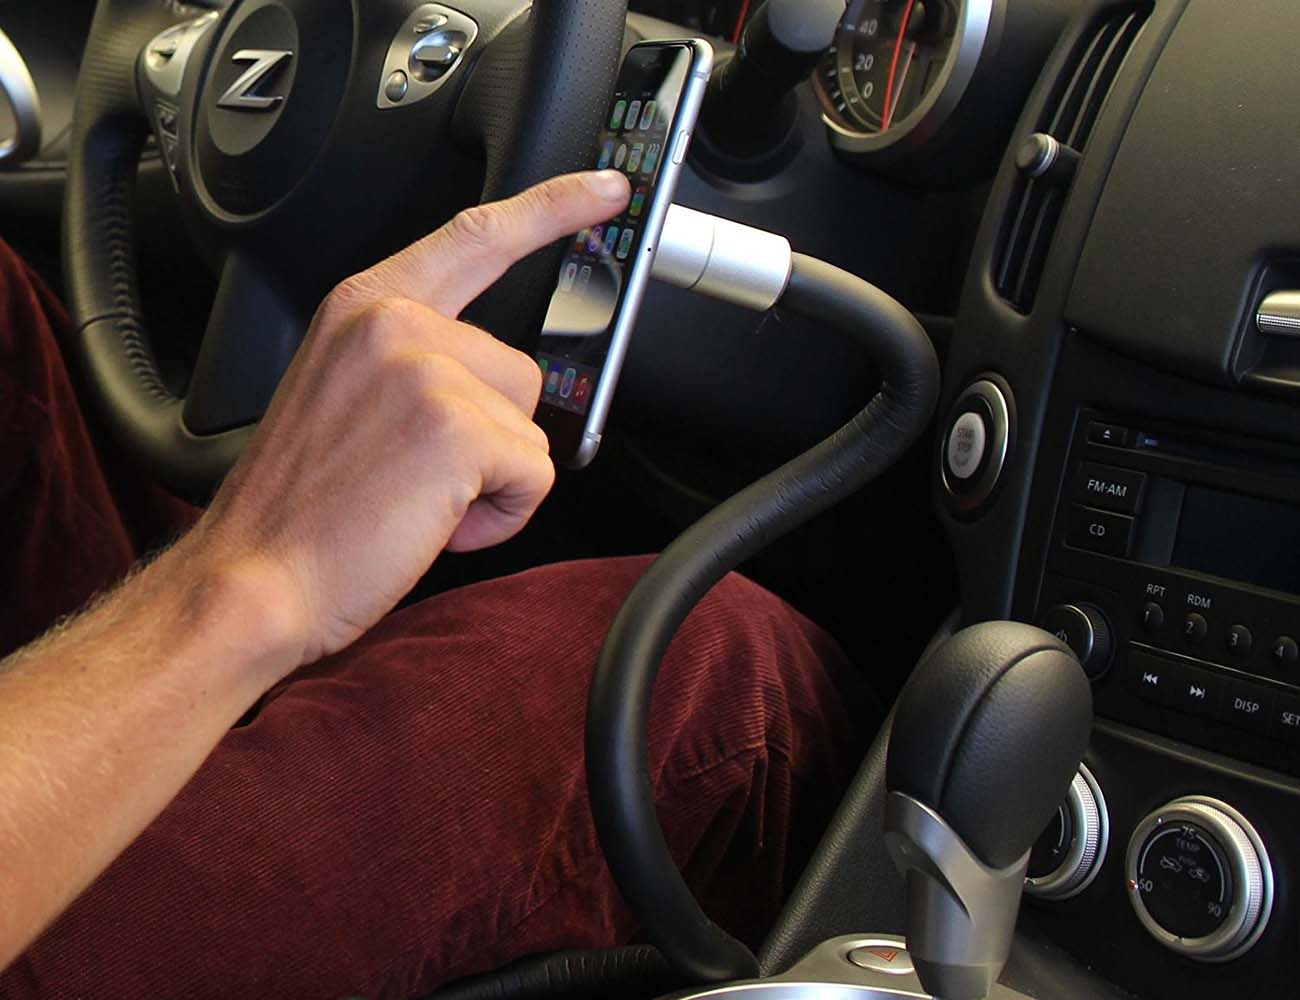 Dundabunga – Mobile Freedom